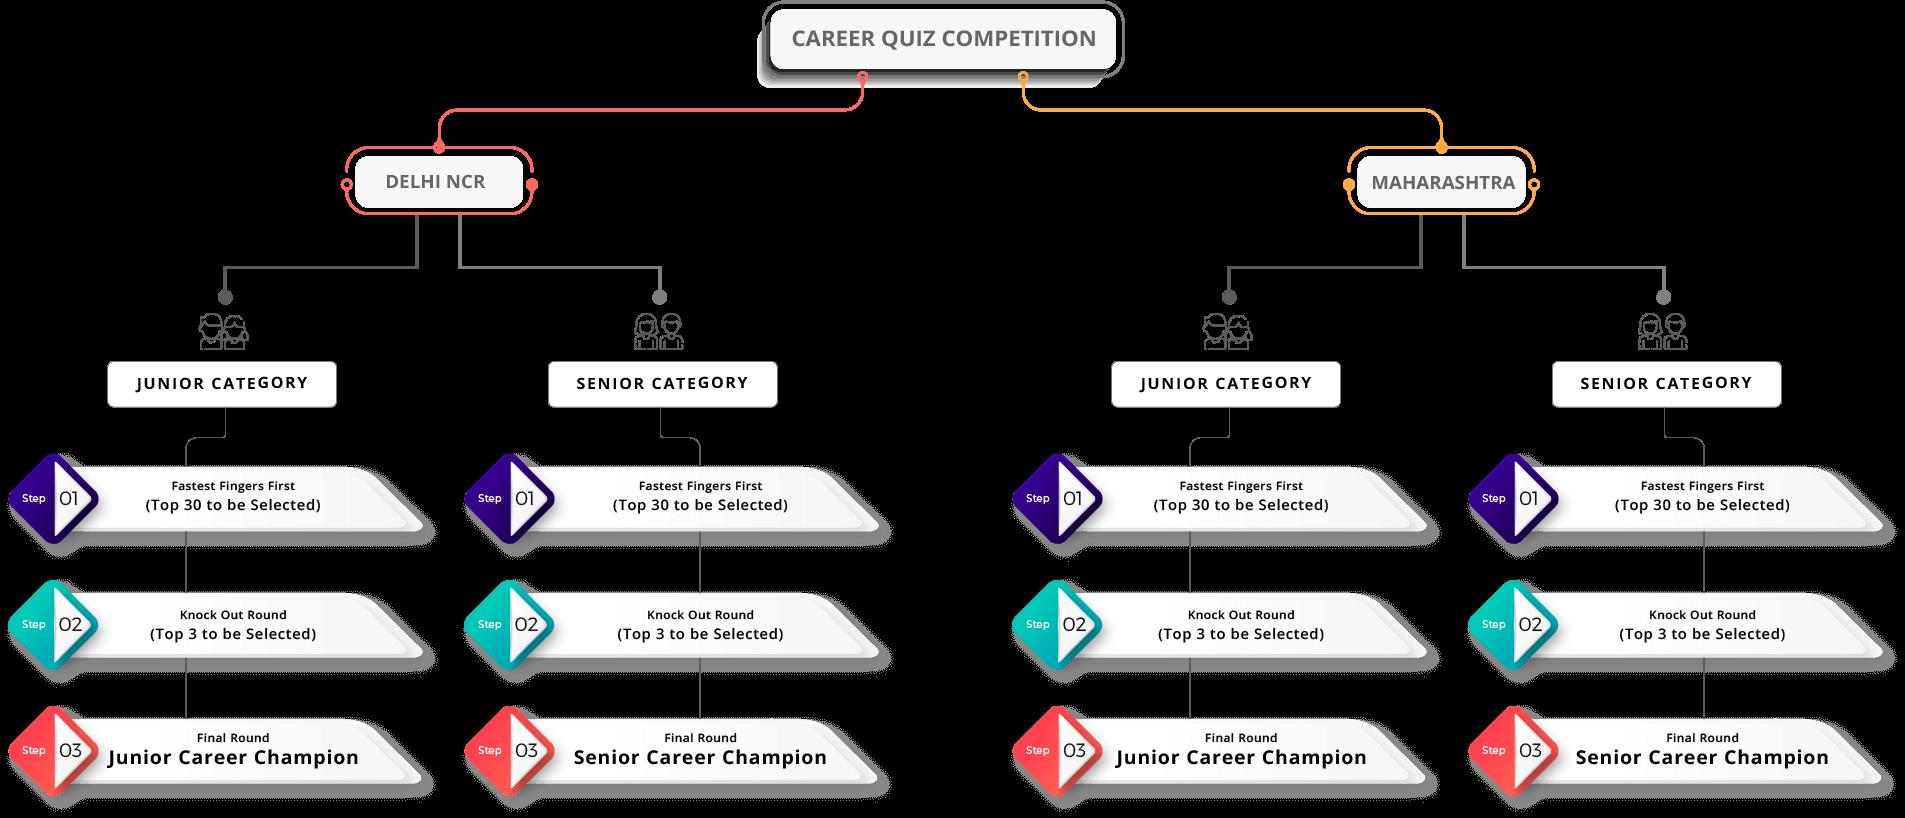 Career Quiz Competition